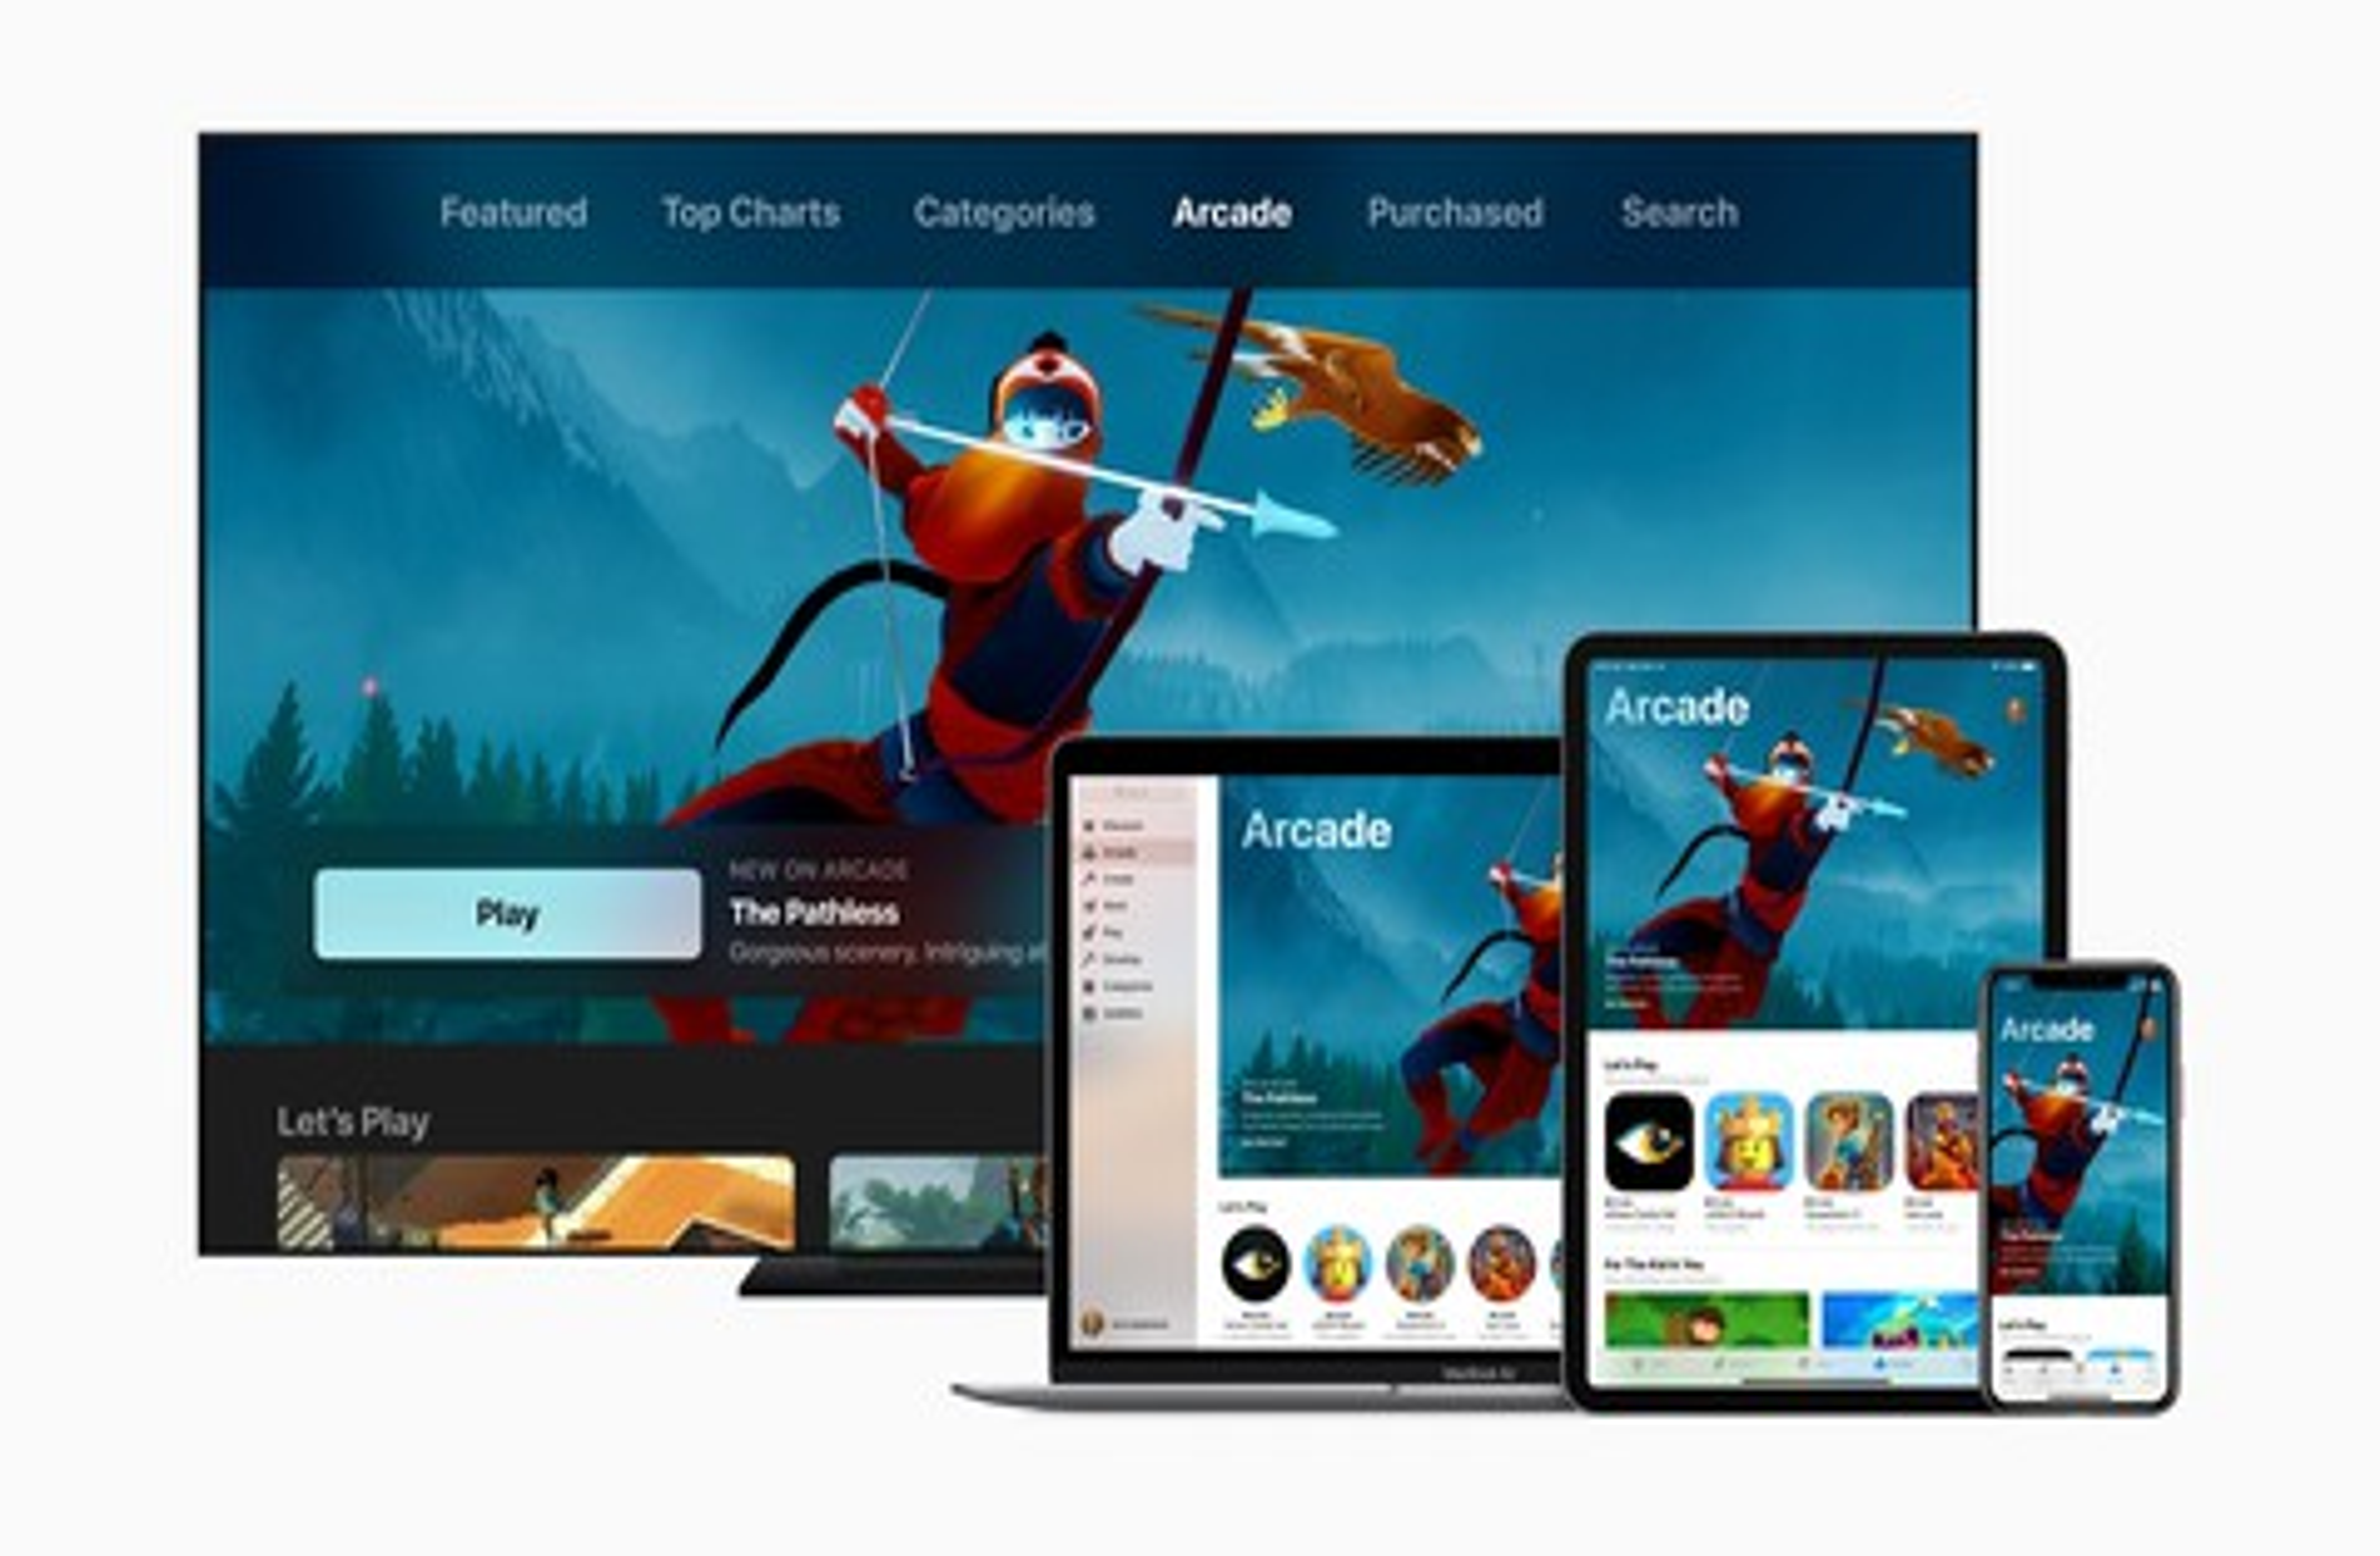 Apple-introduces-apple-arcade-apple-tv-ipad-pro-iphone-xs-macbook-pro-03252019